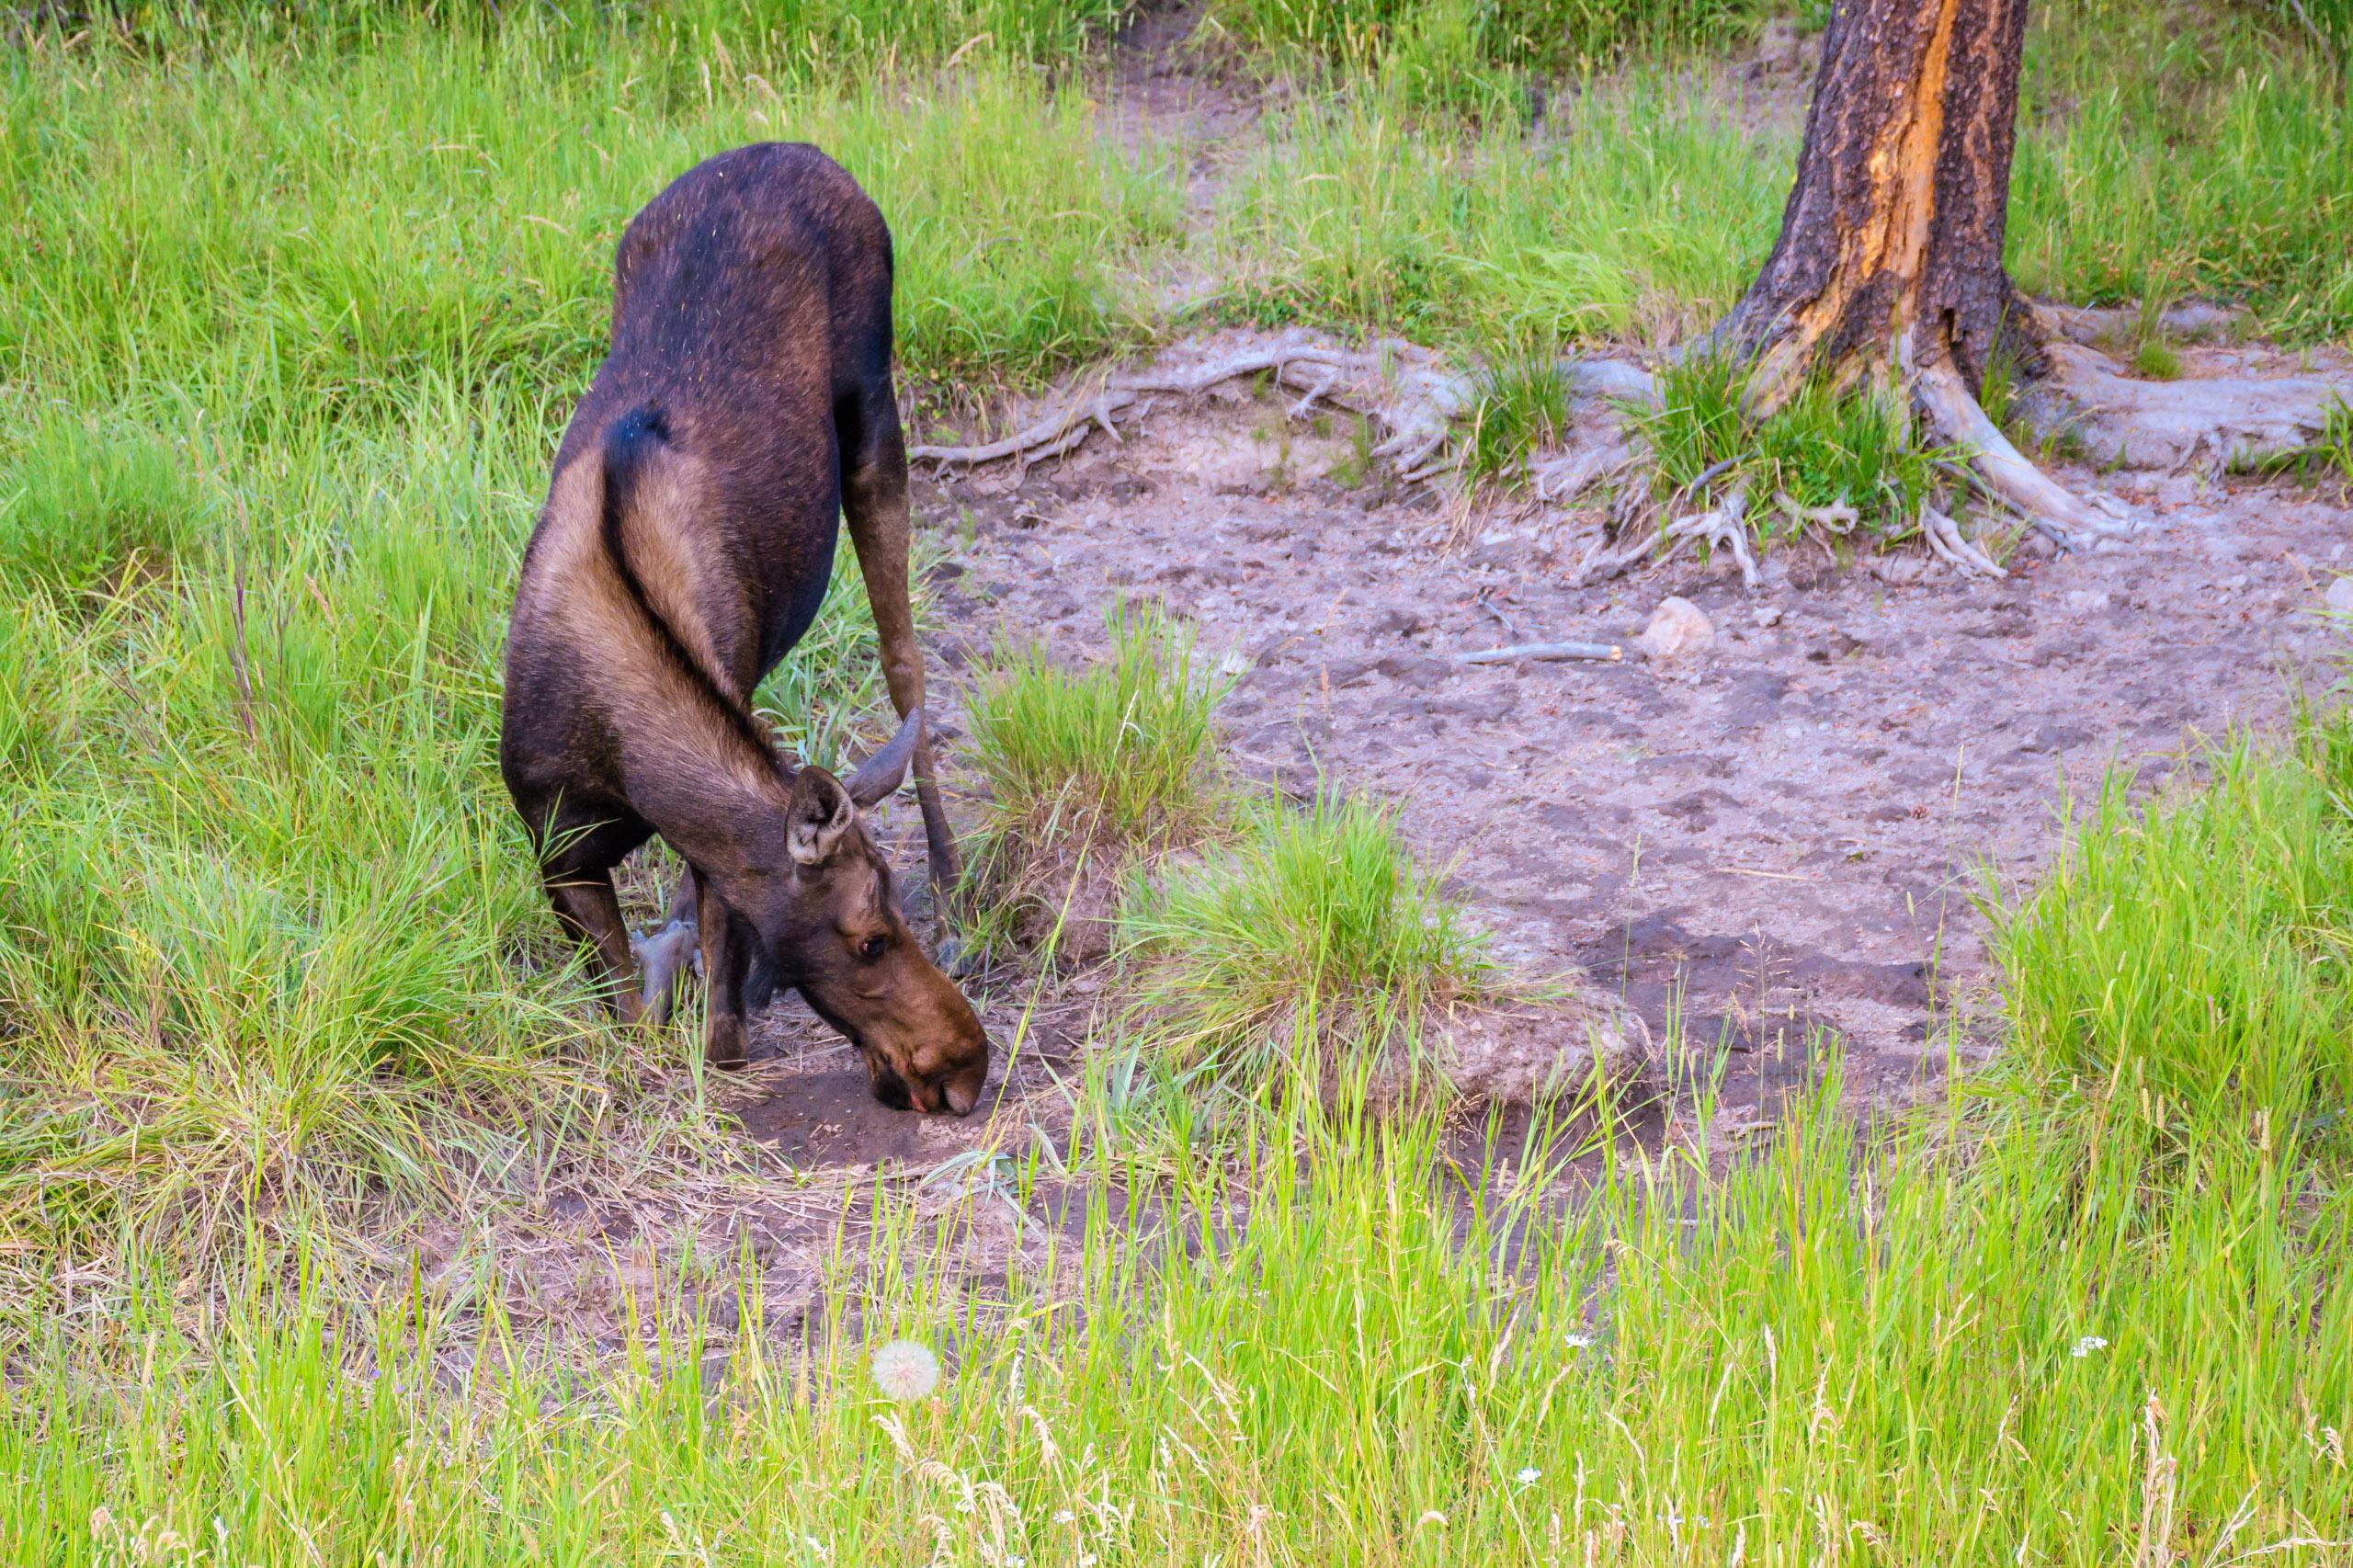 Cow Moose licking some salt